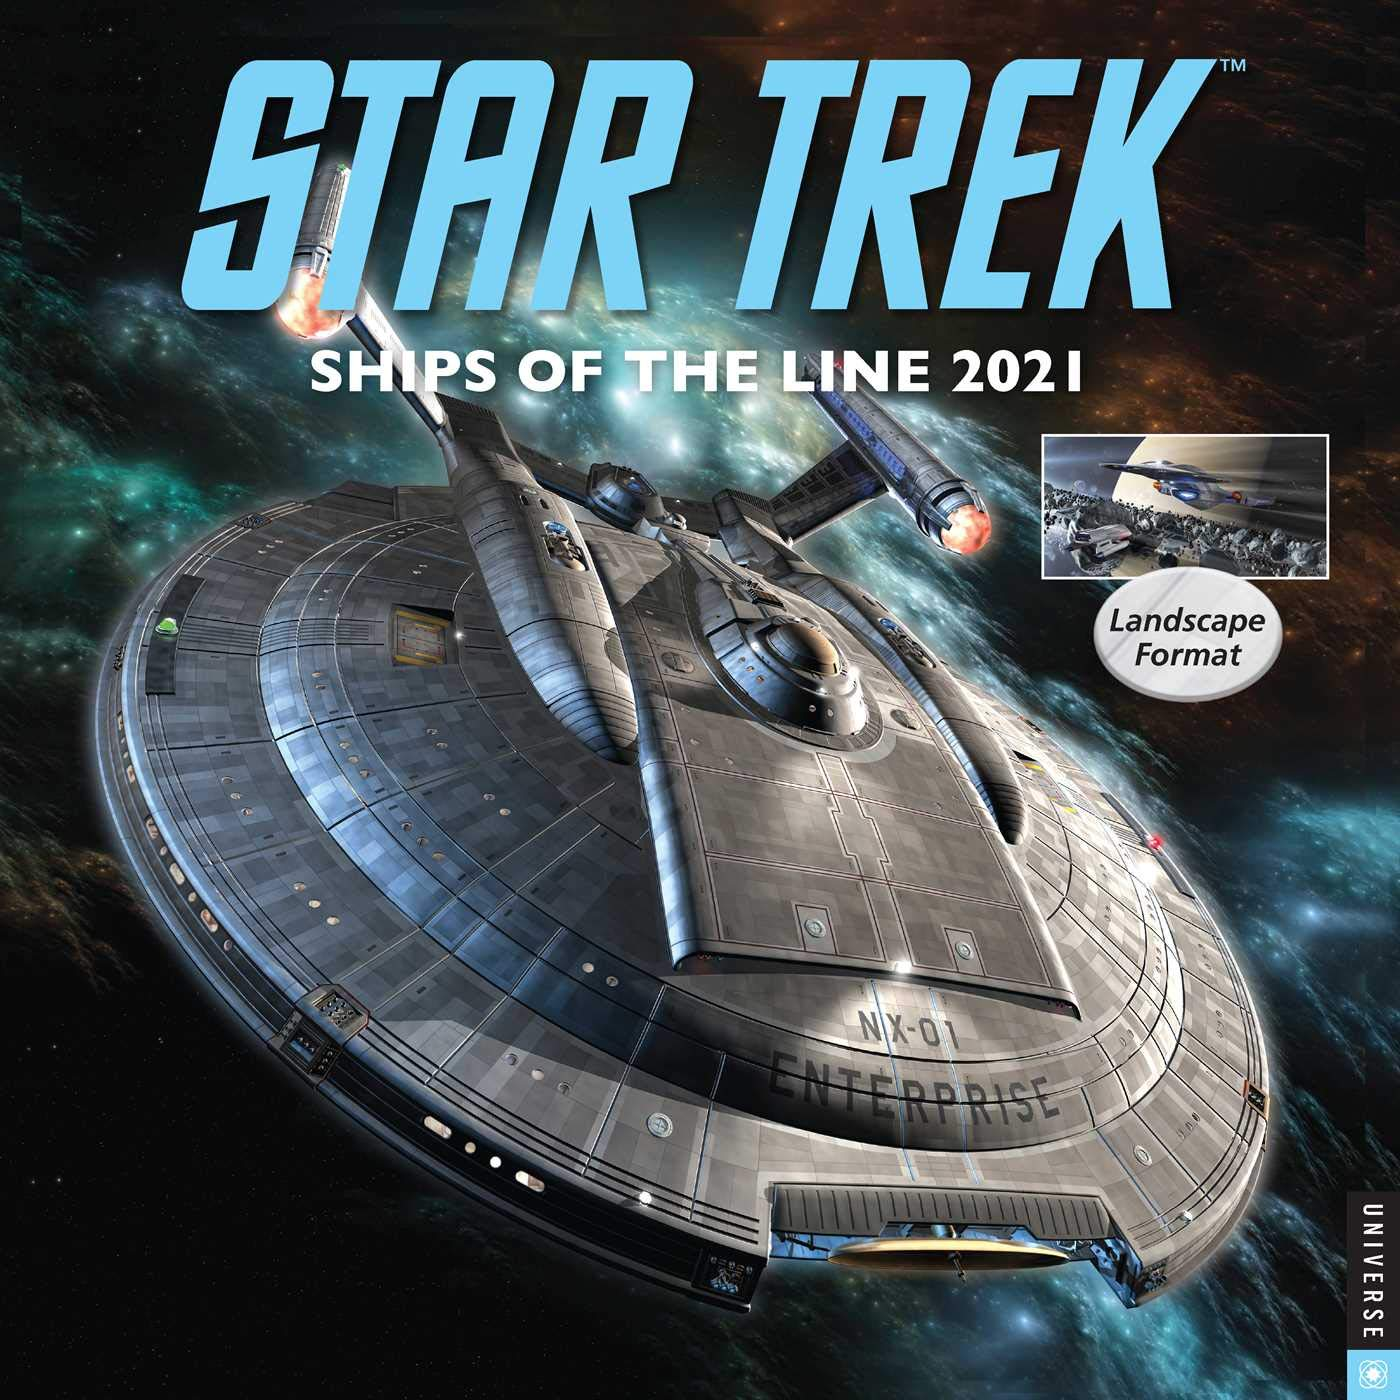 Calendario Star Trek 2021 Amazon.com: Star Trek Ships of the Line 2021 Wall Calendar